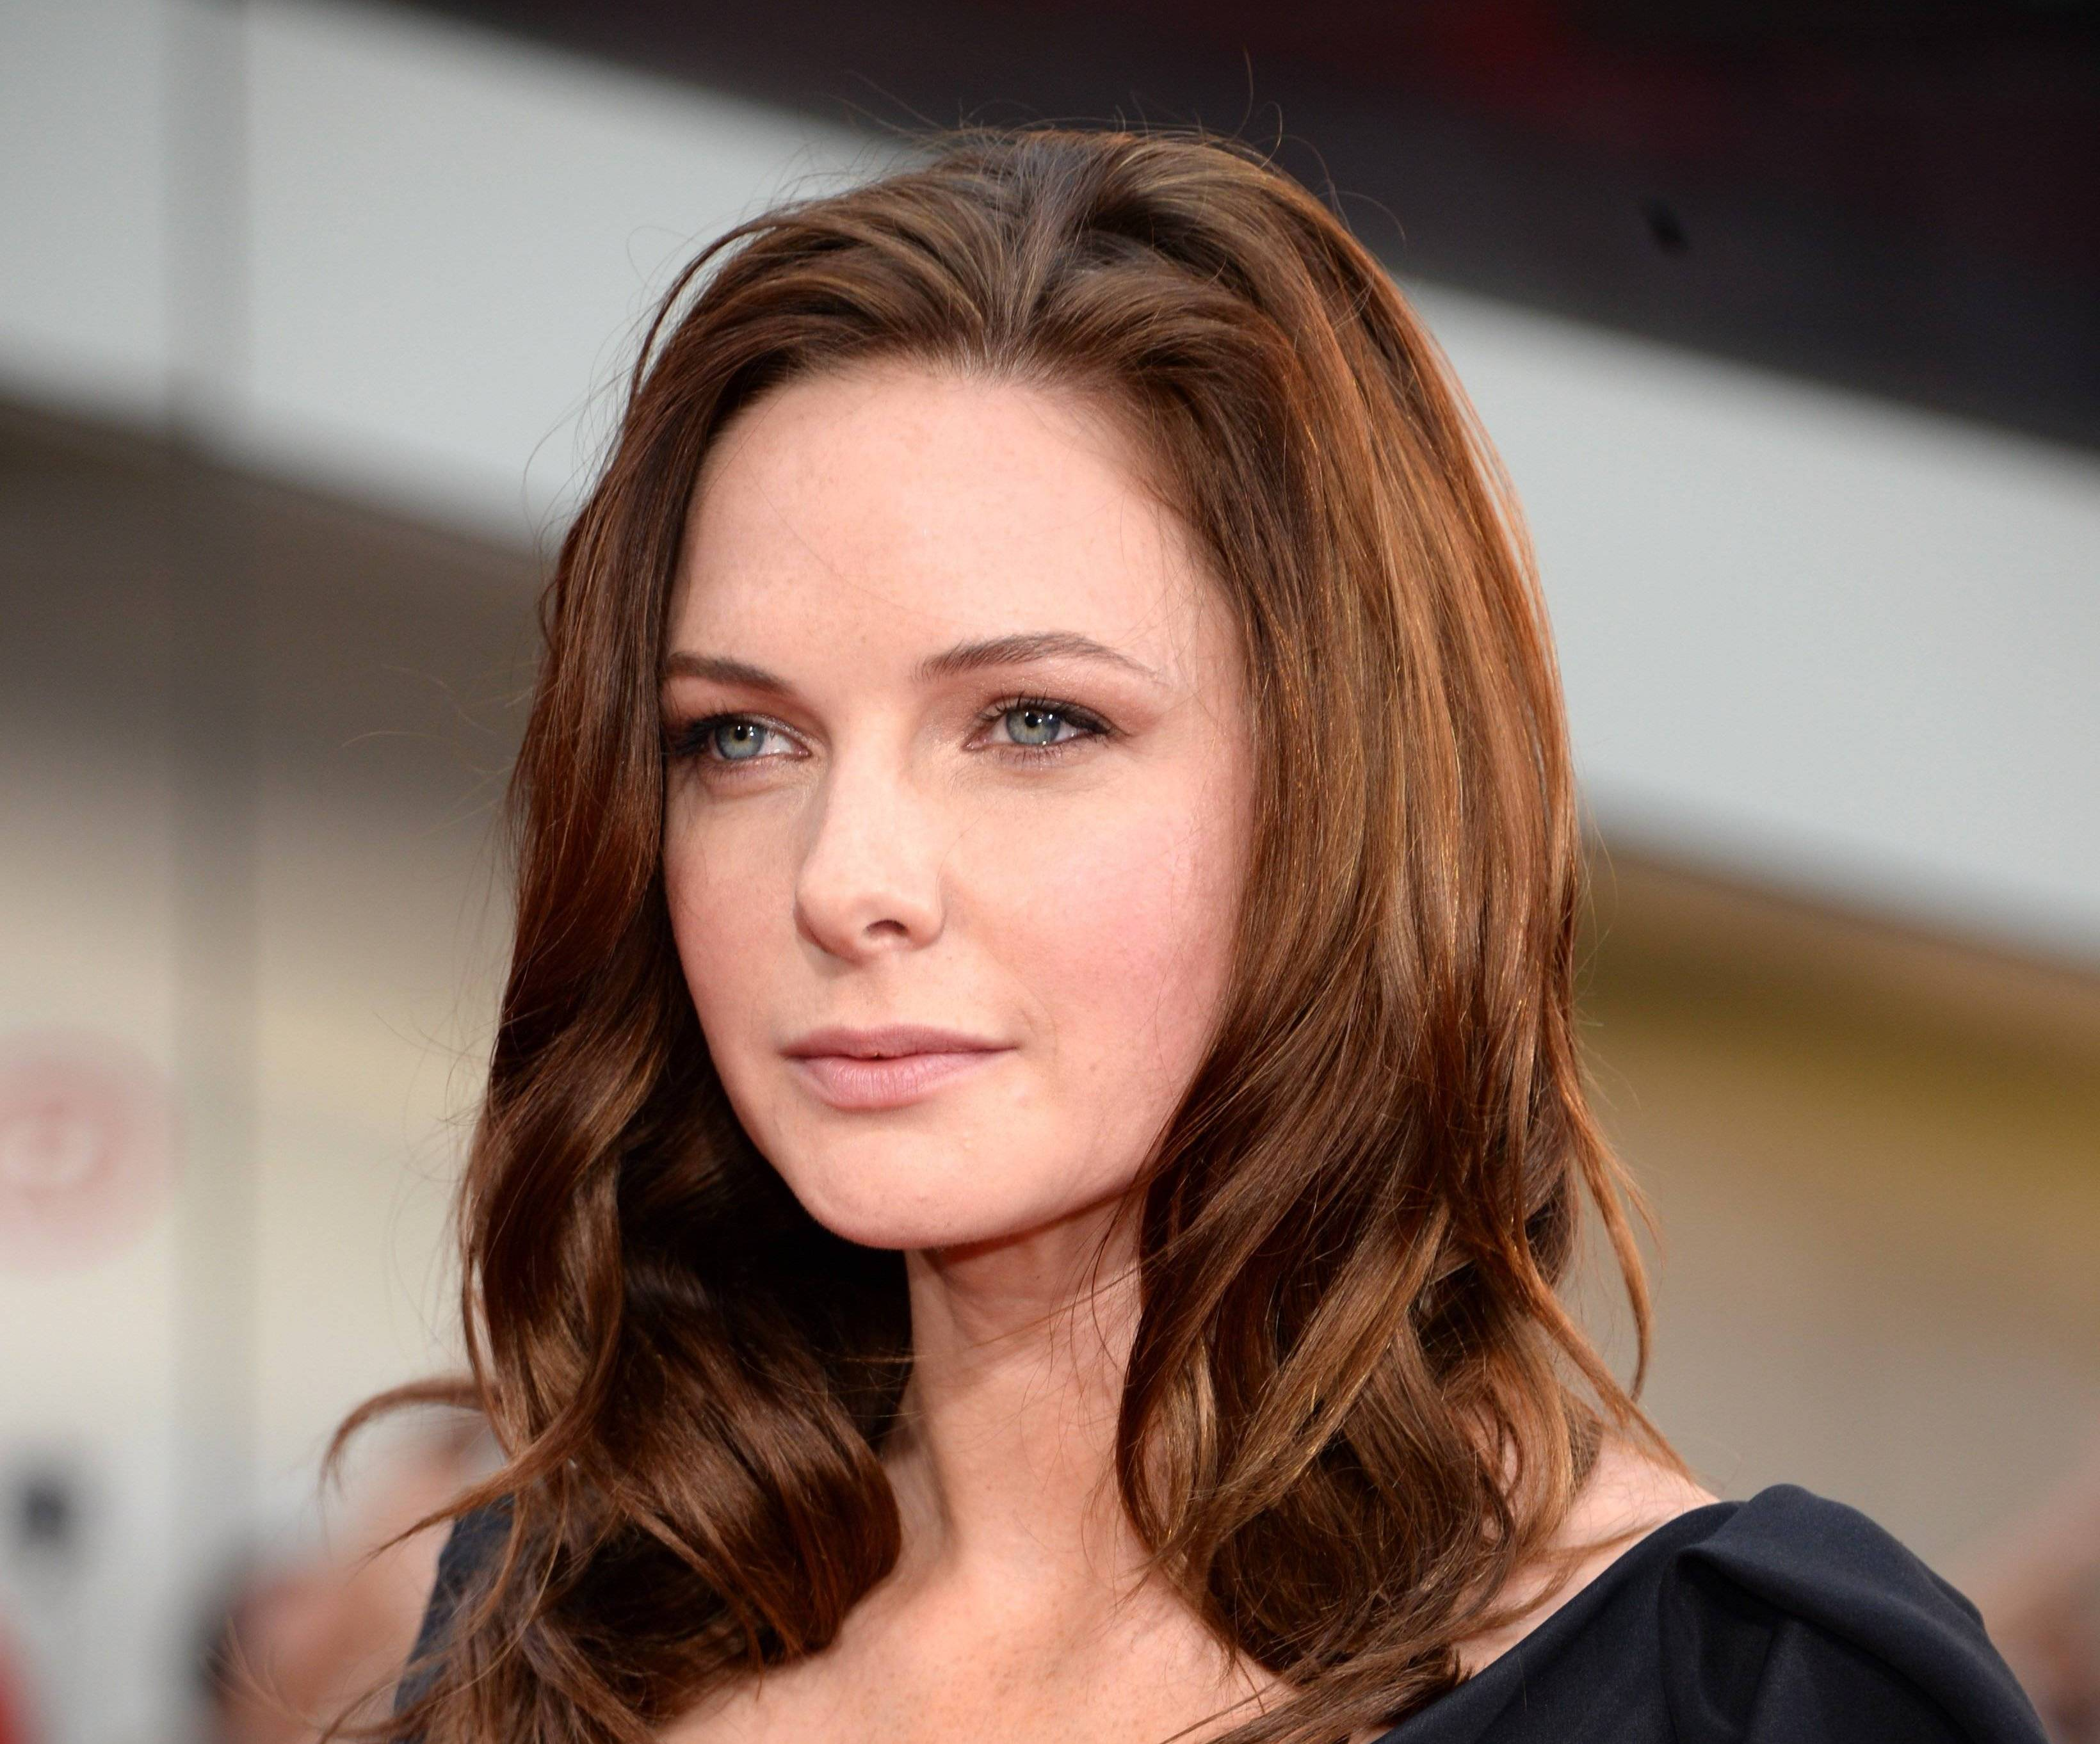 Rebecca-Ferguson-Wiki-Biography-Age-Height-Weight-Profile-Body Measurement